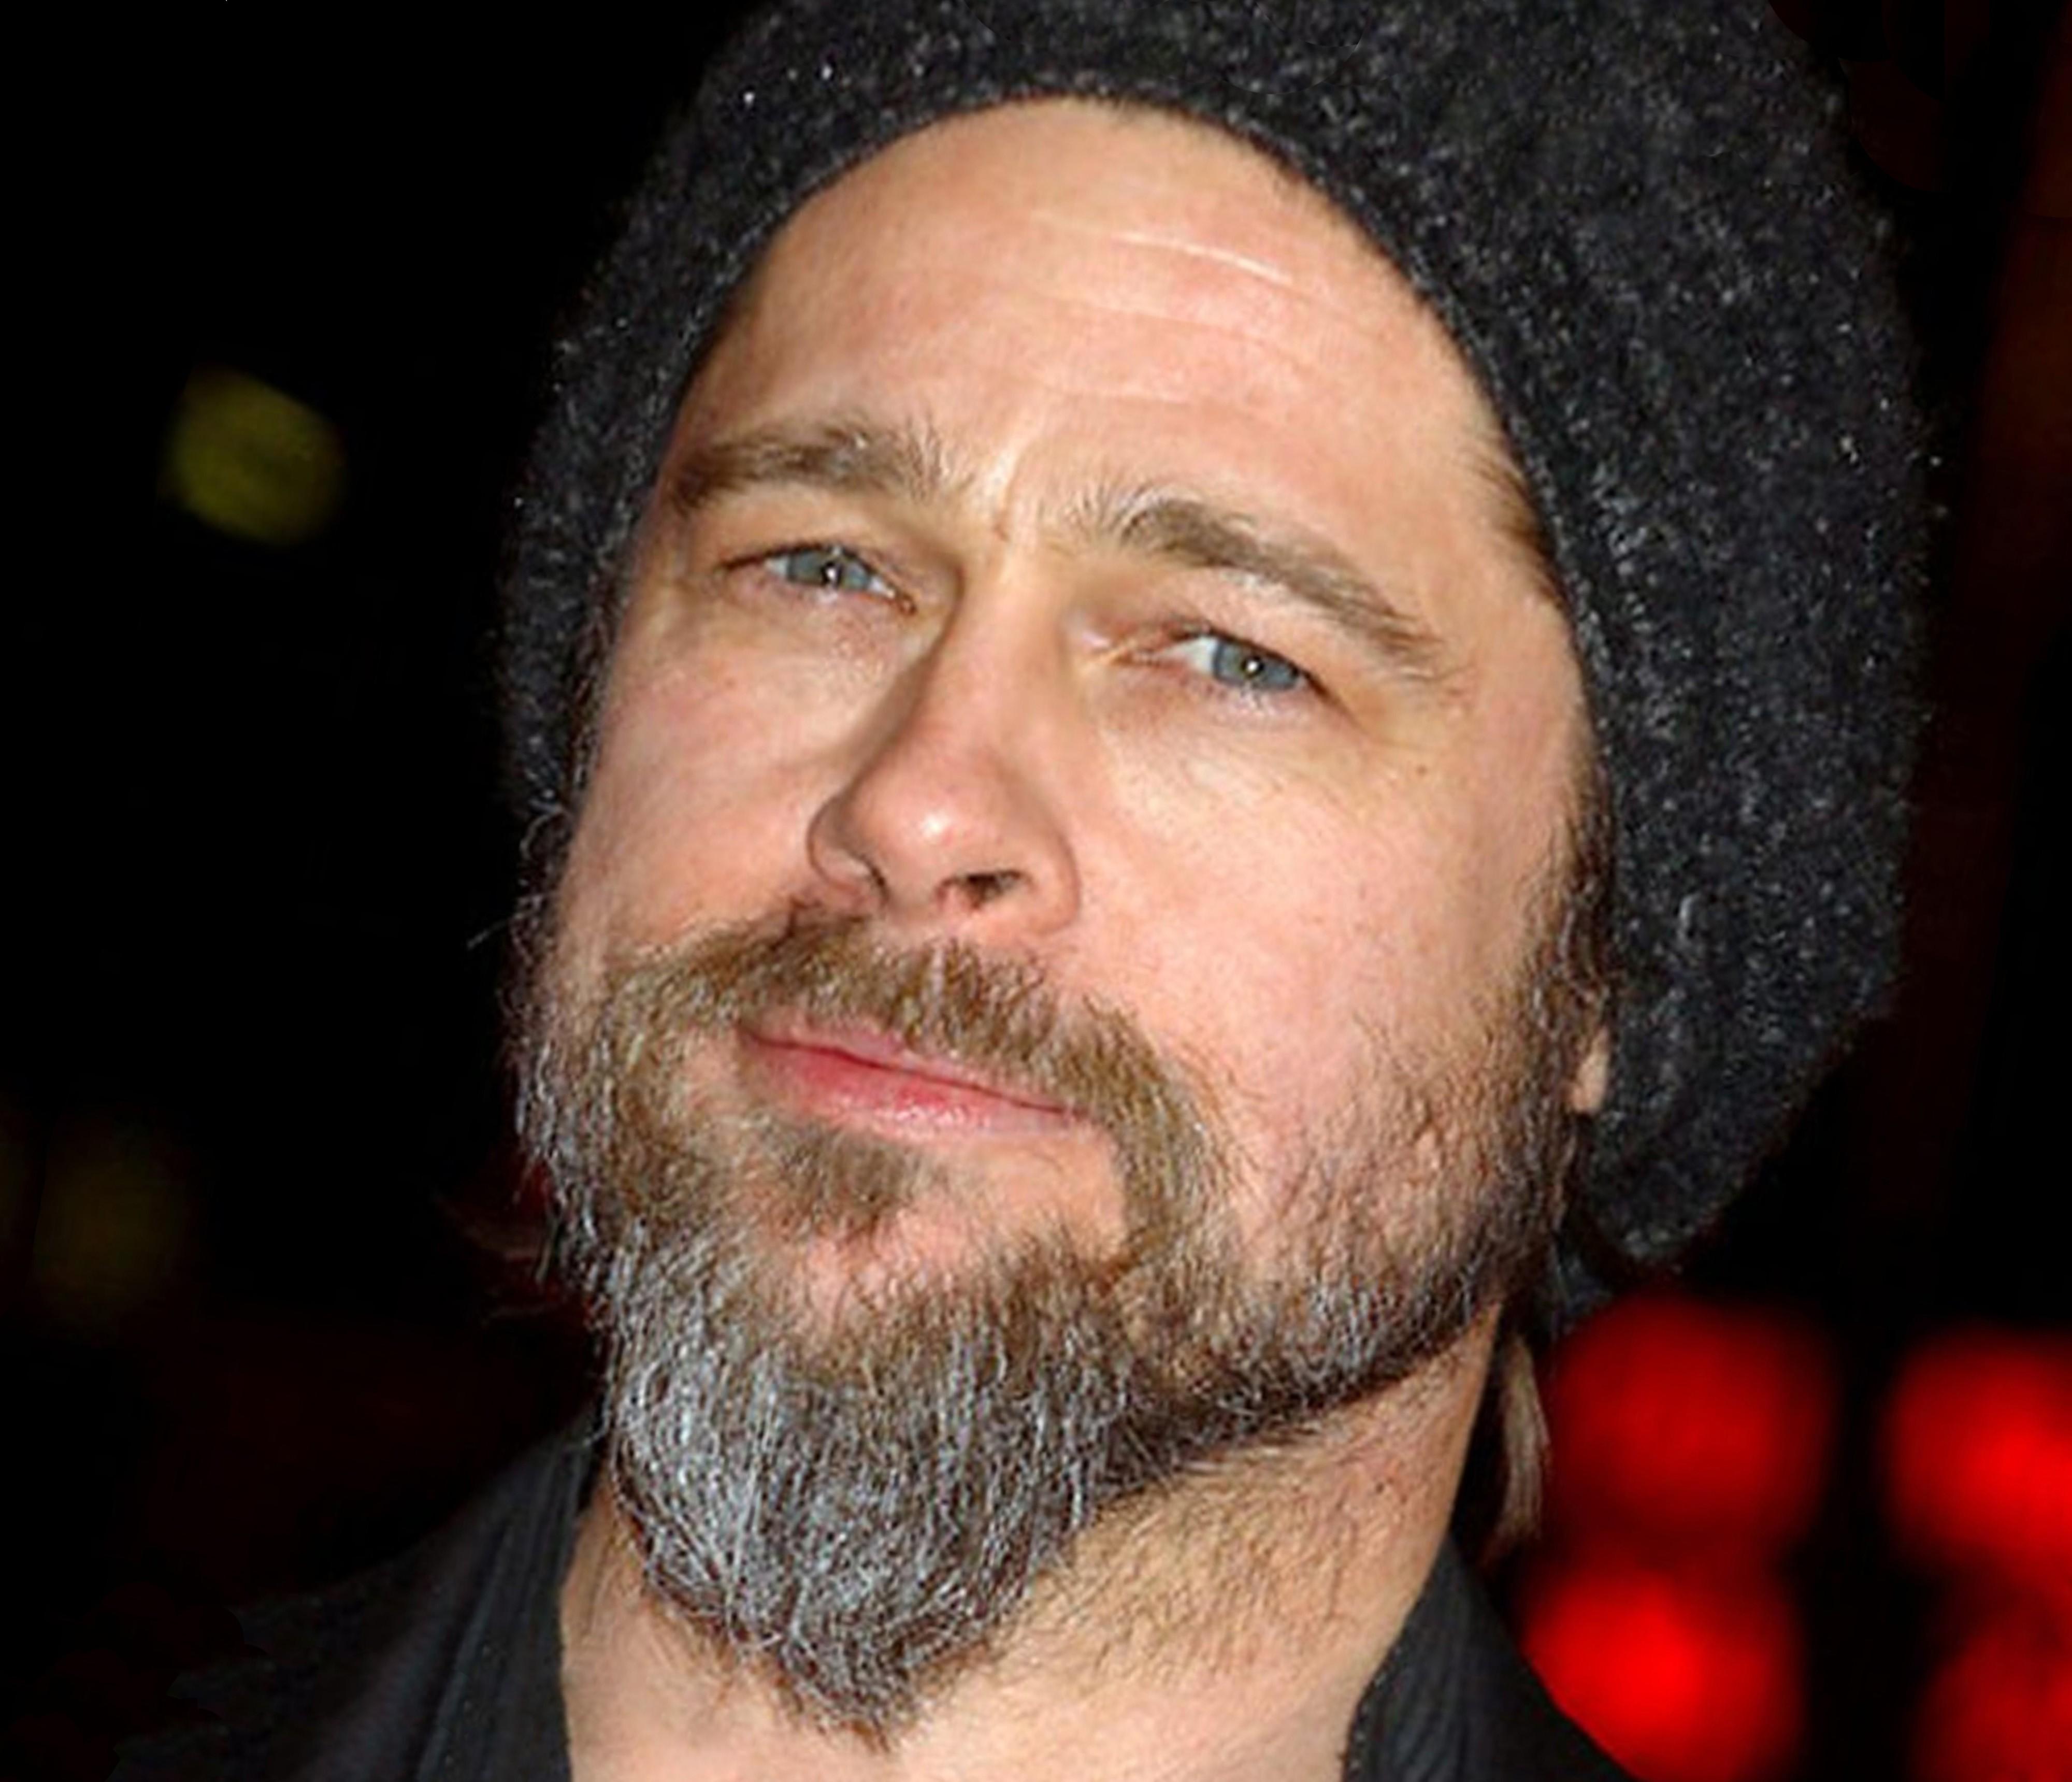 A long beard style of Brad Pitt.